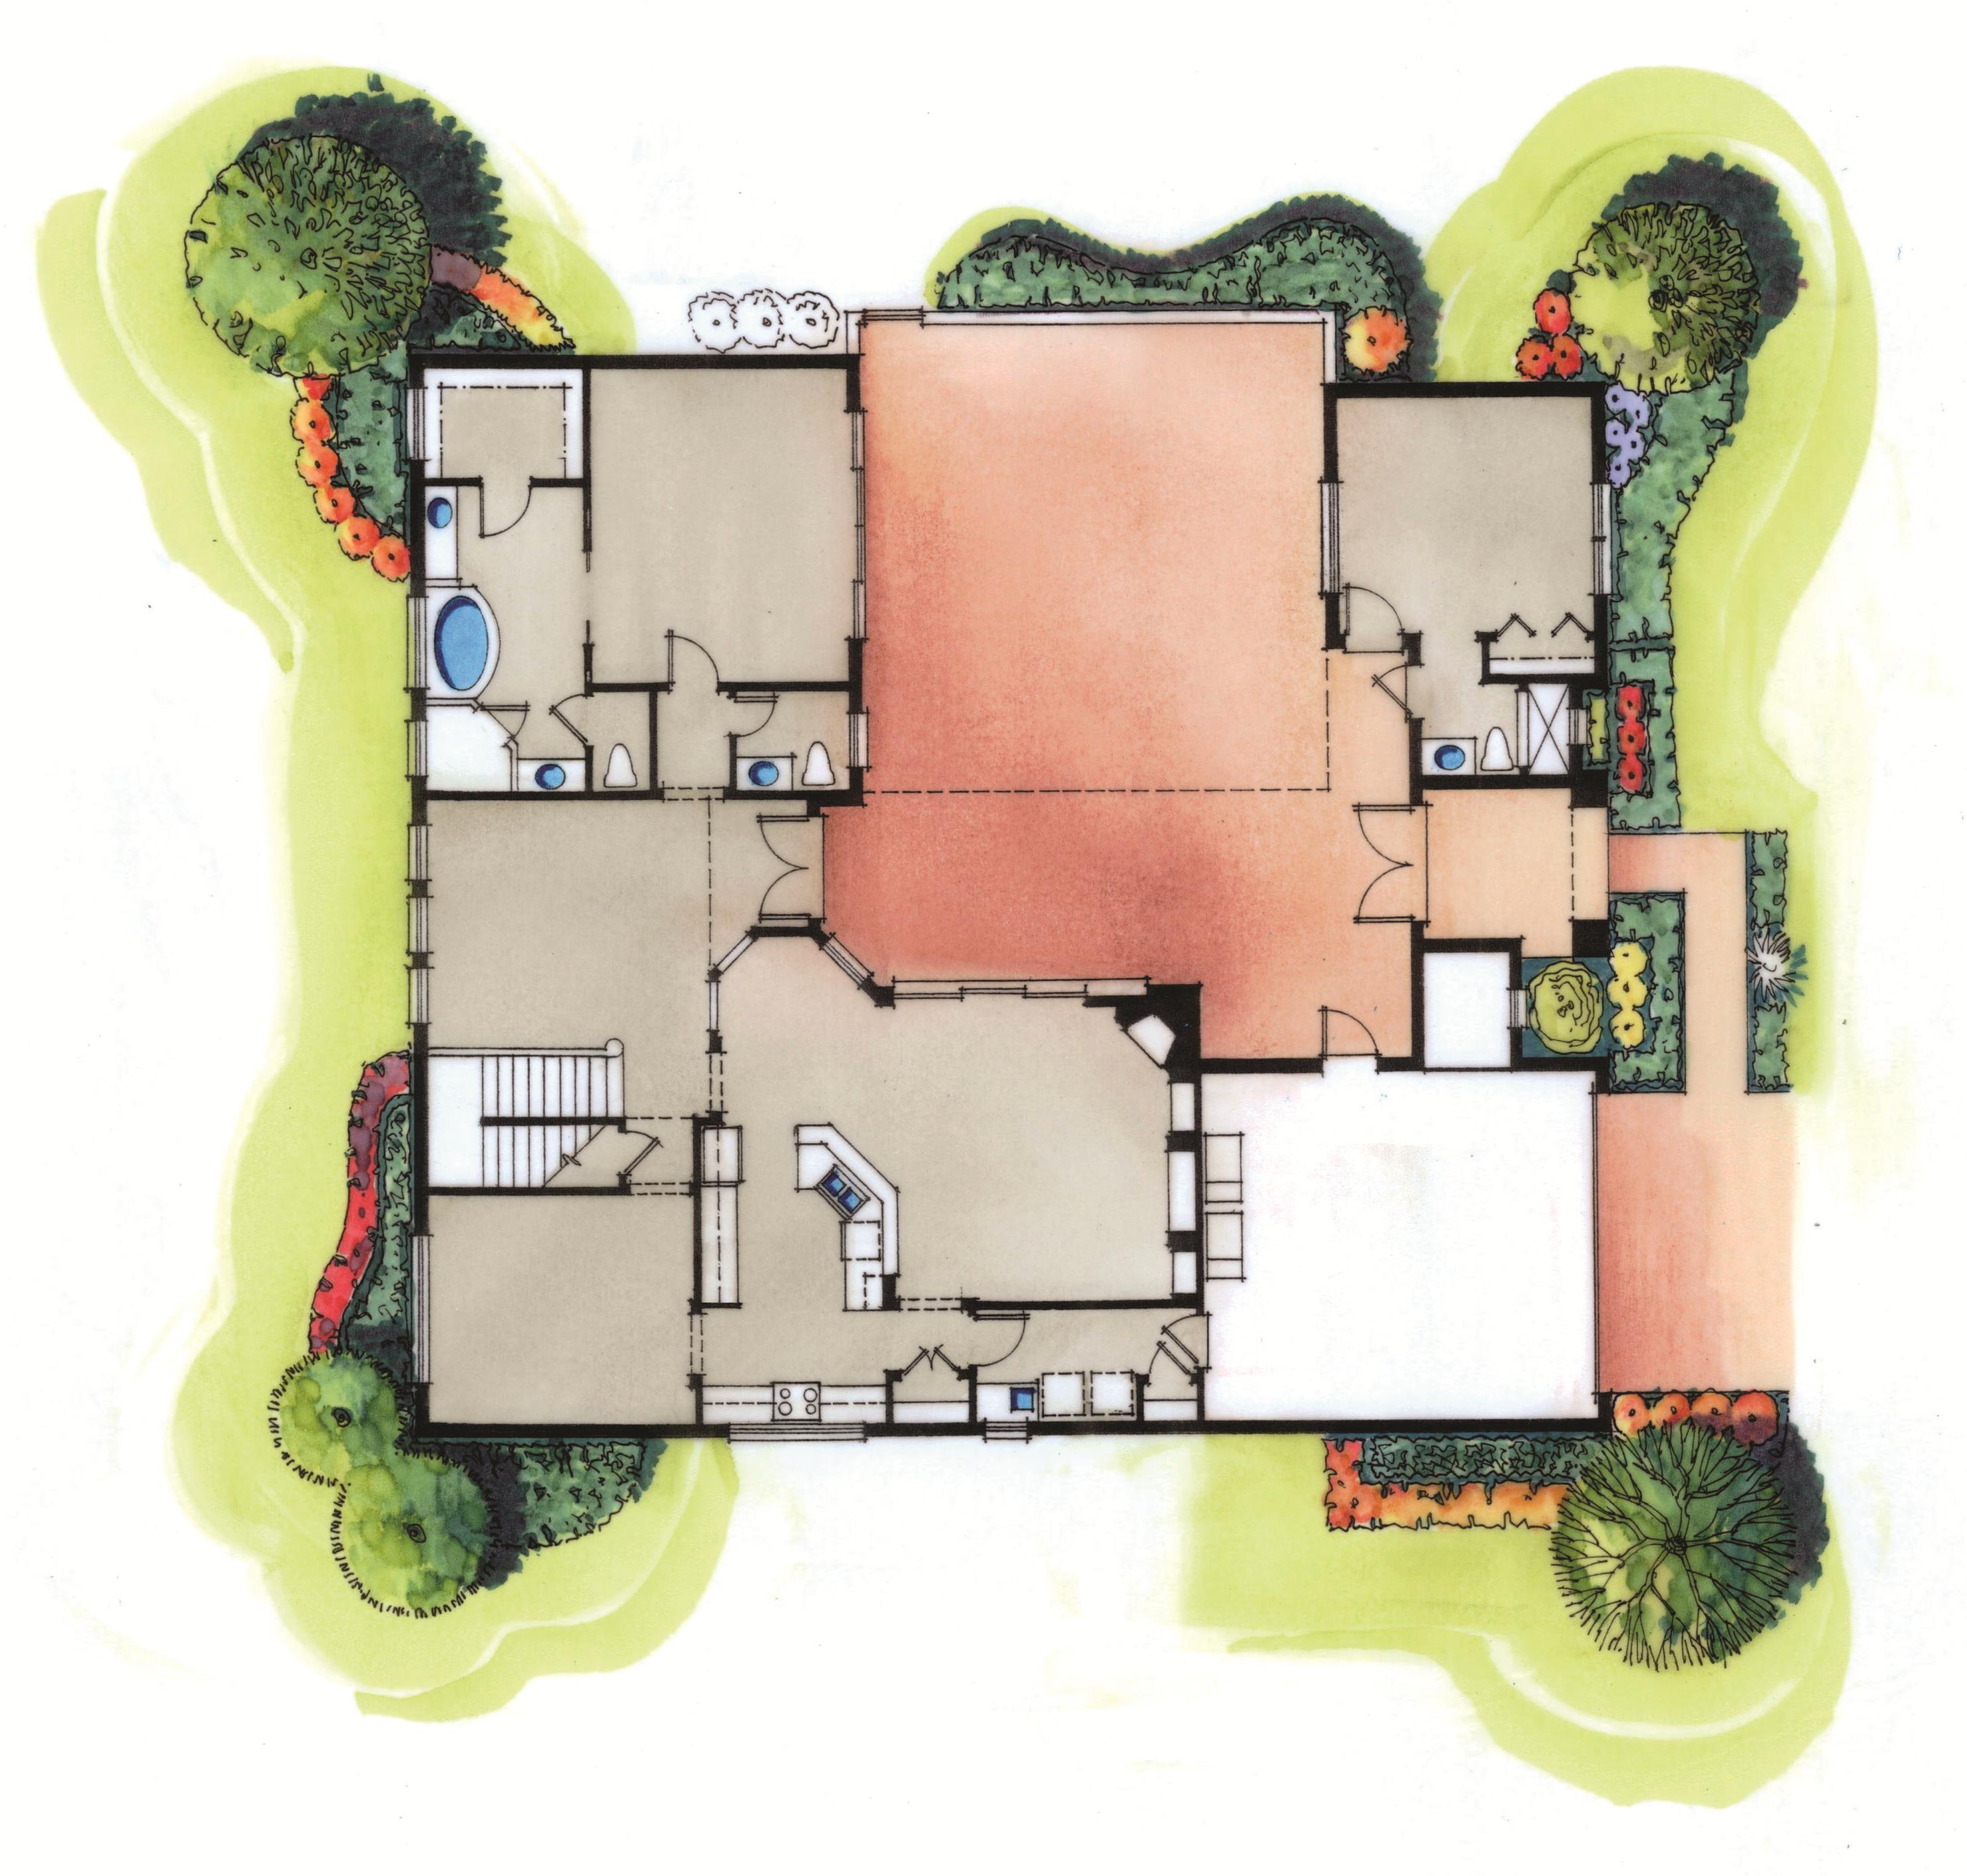 The Courtyard II